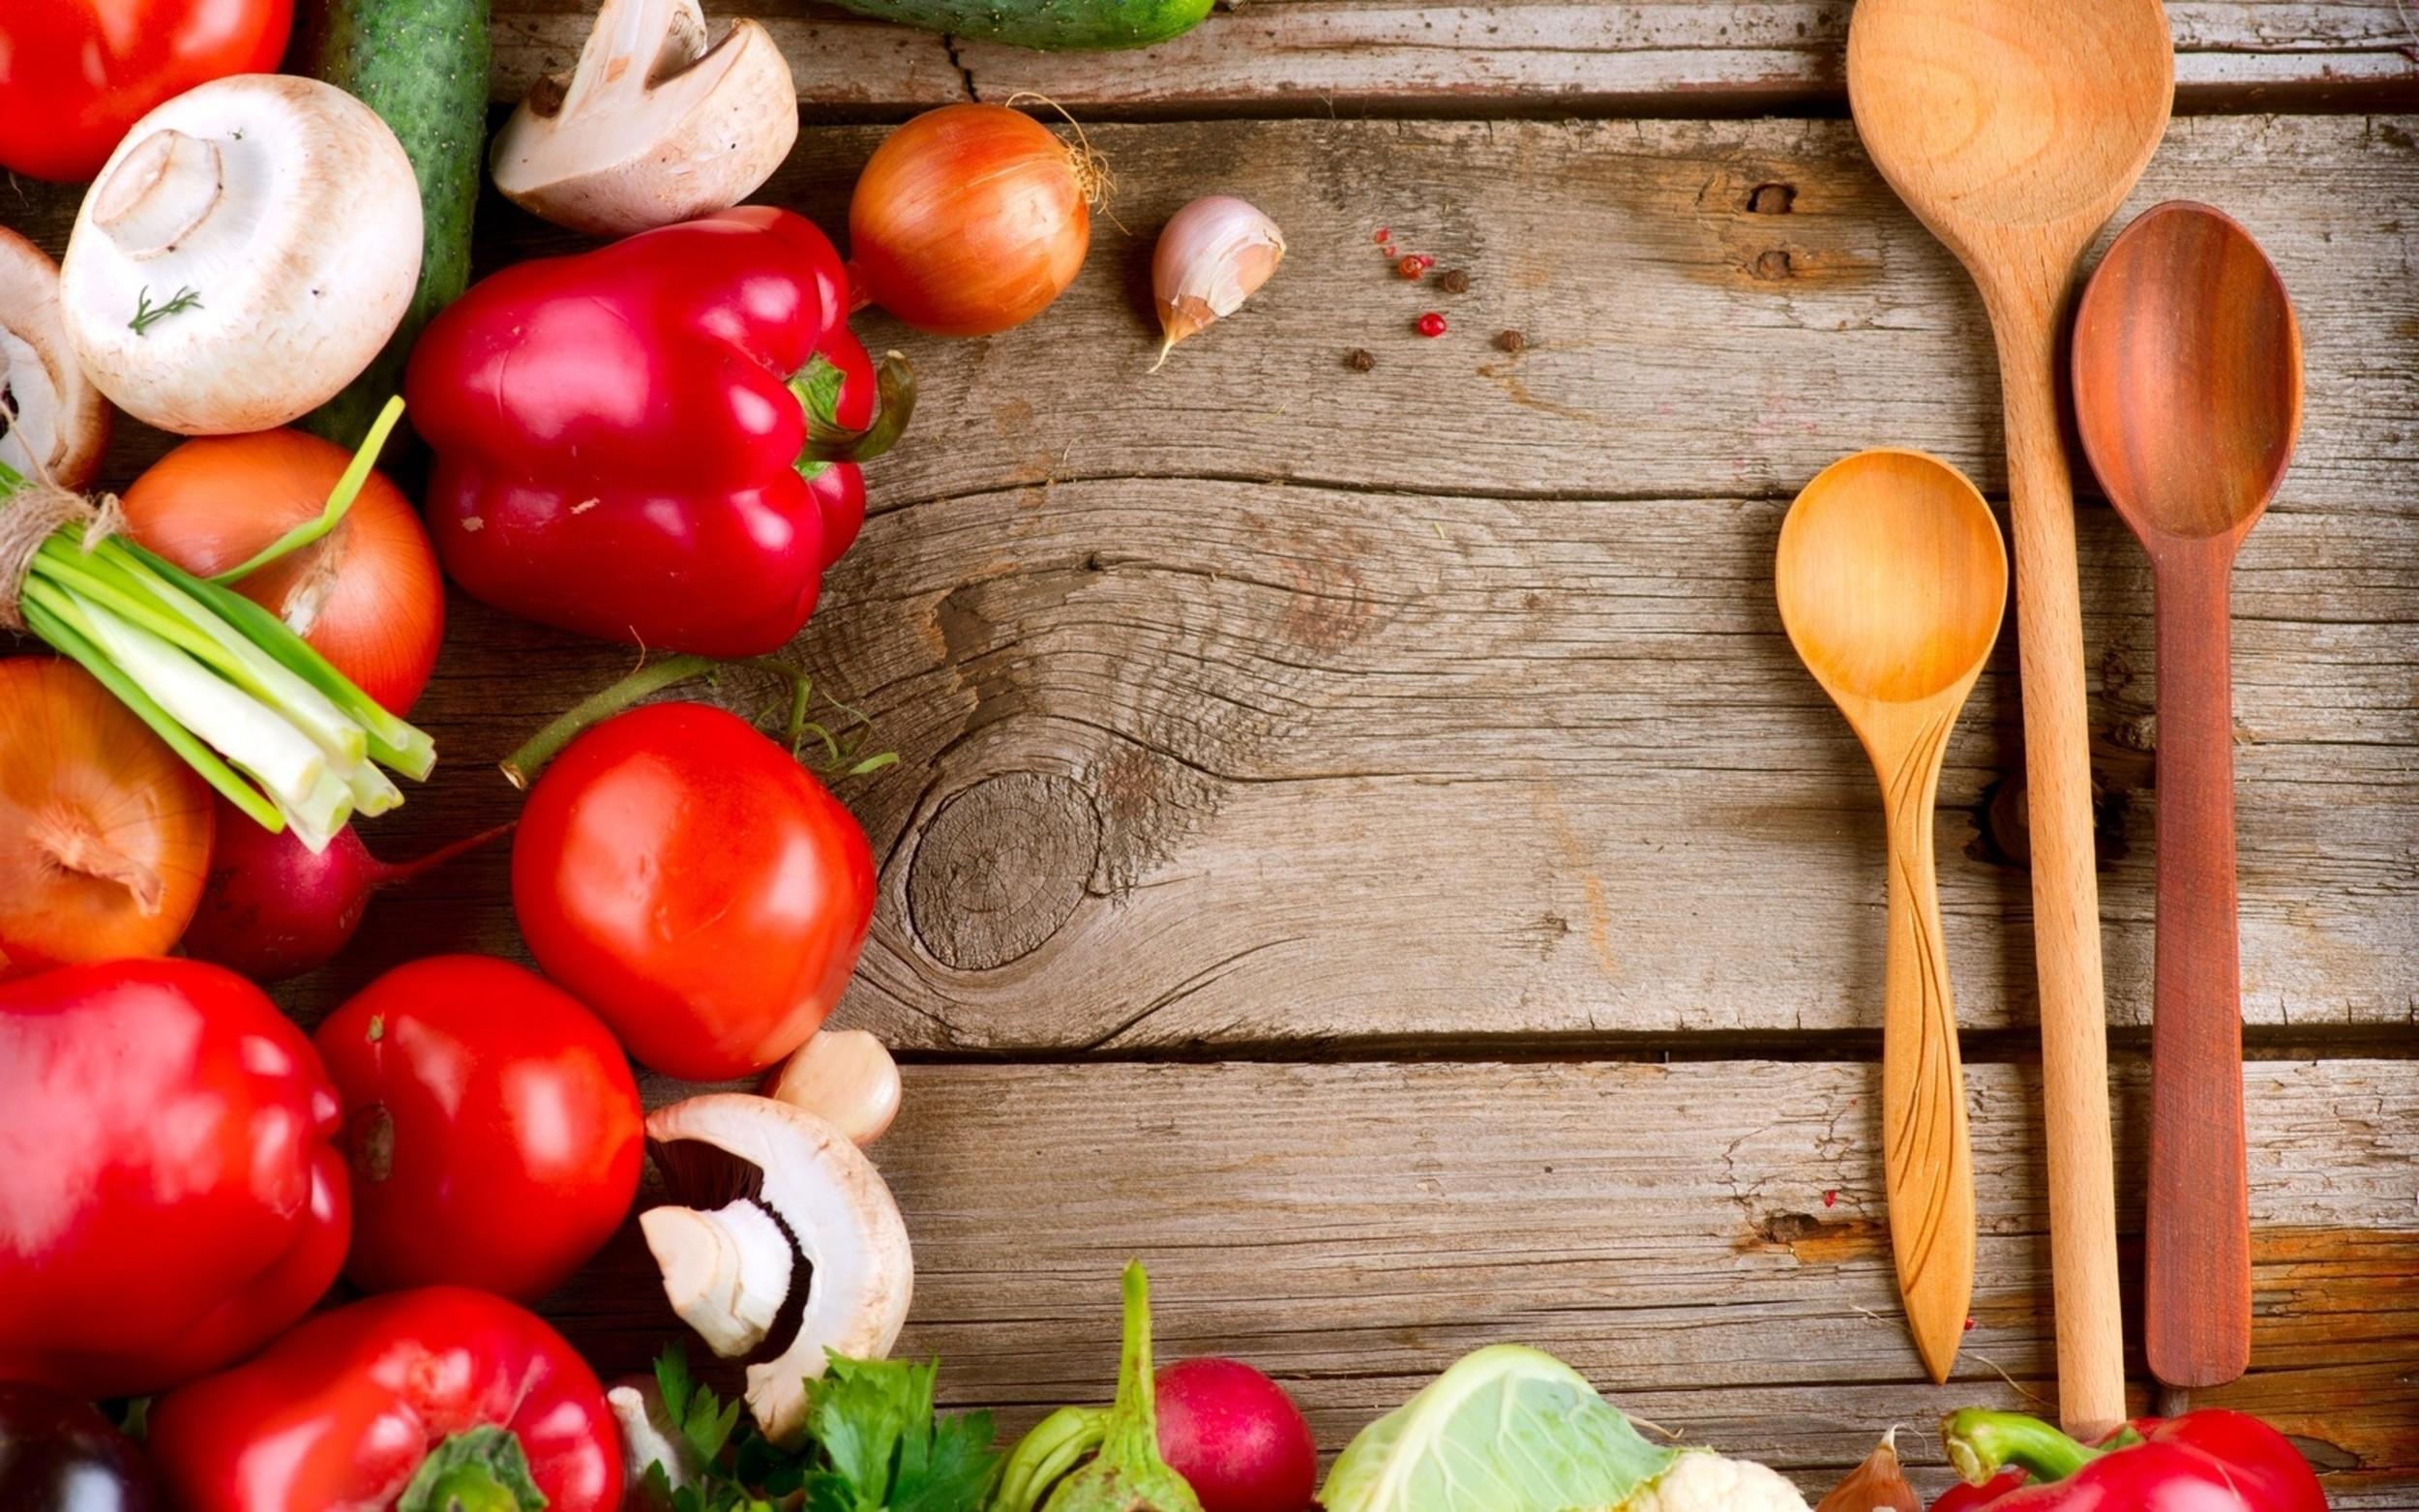 Food Share Produce Distribution